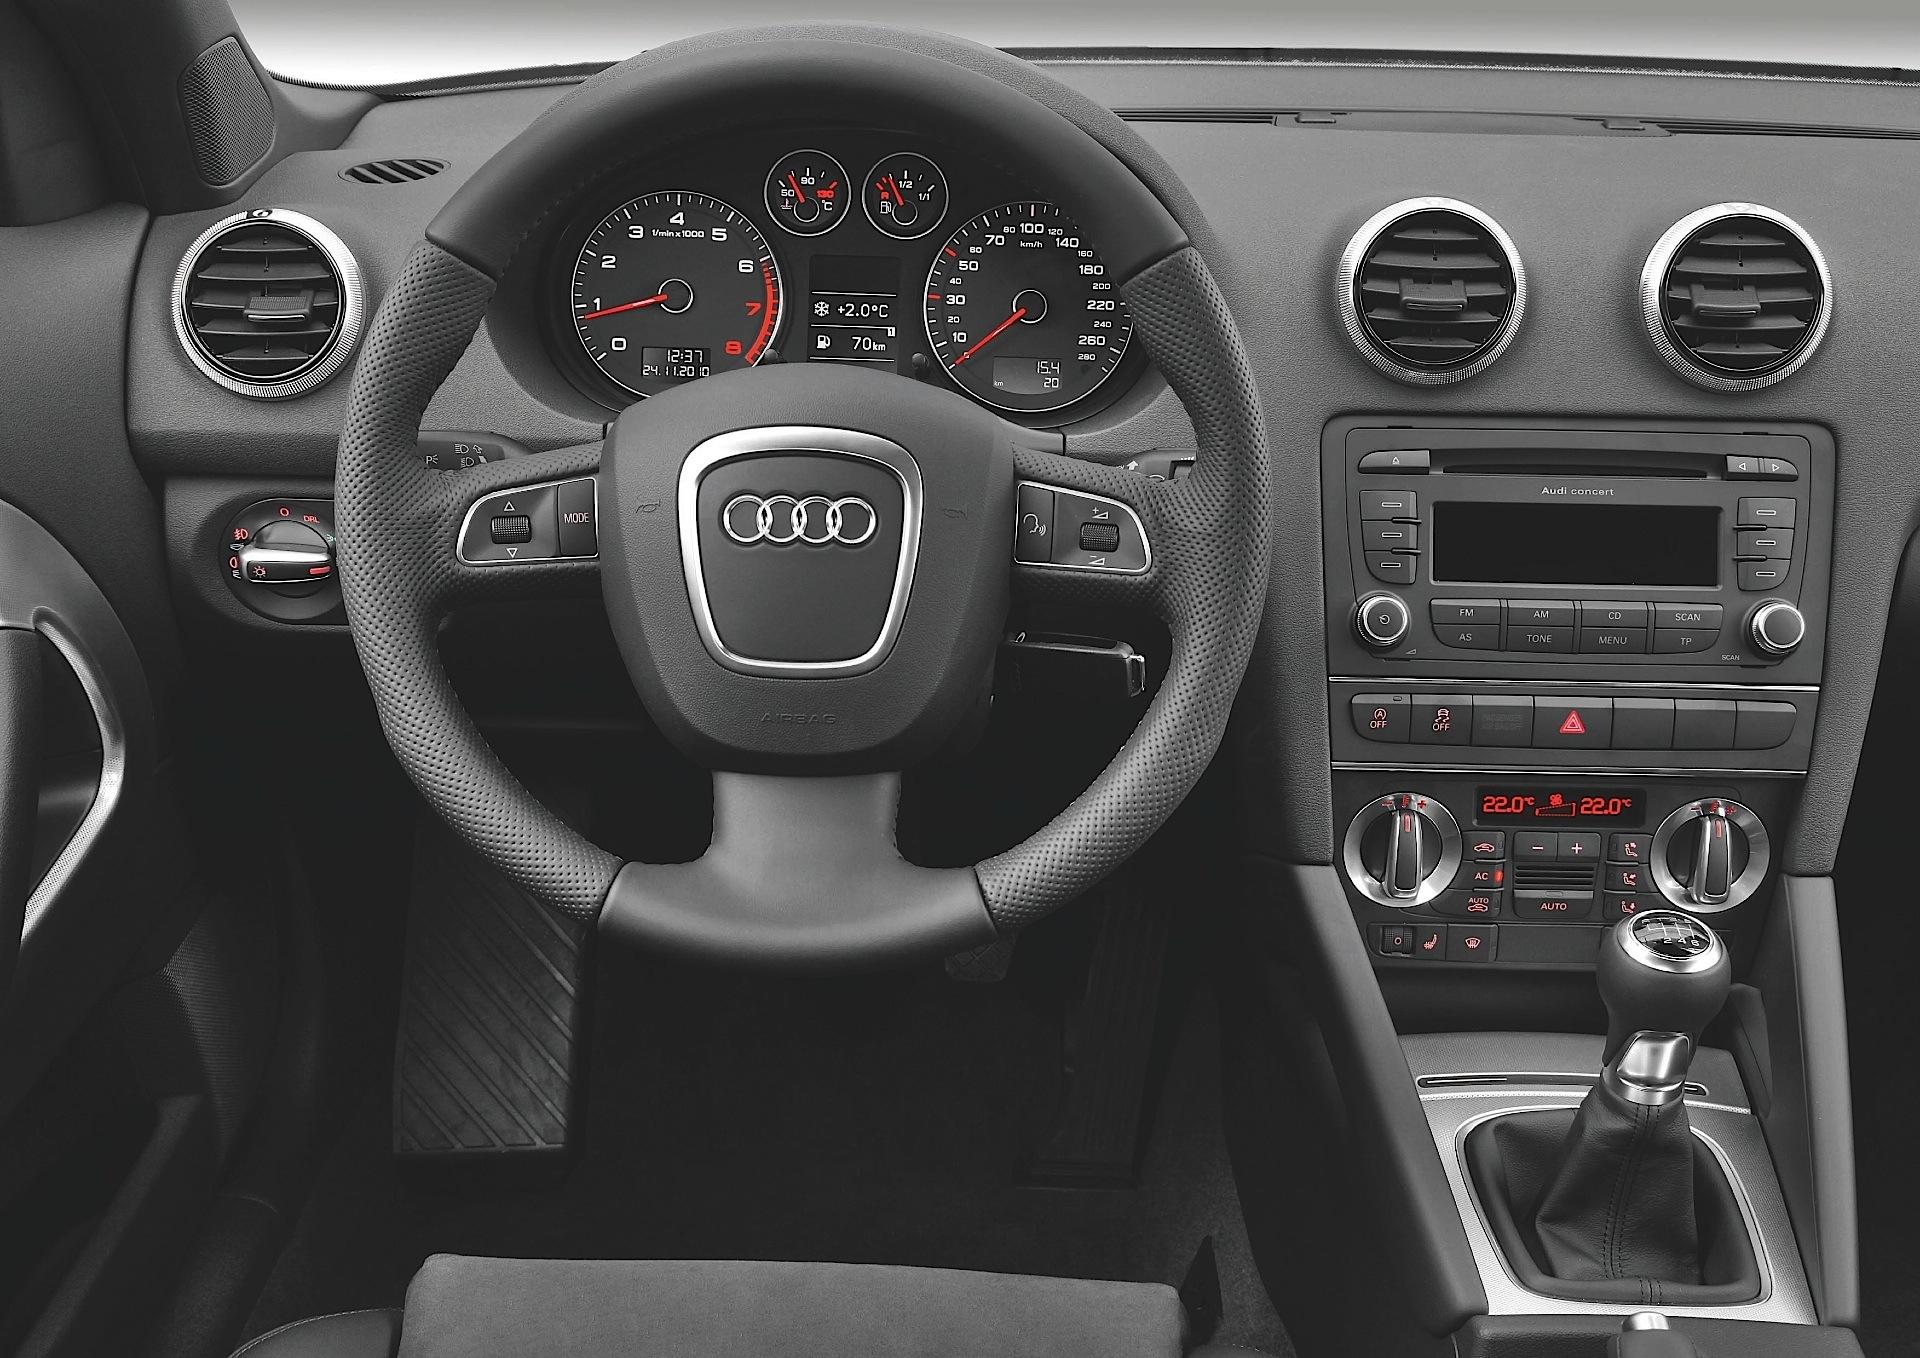 Audi a3 cabriolet specs 2008 2009 2010 2011 2012 for Audi a3 onderdelen interieur